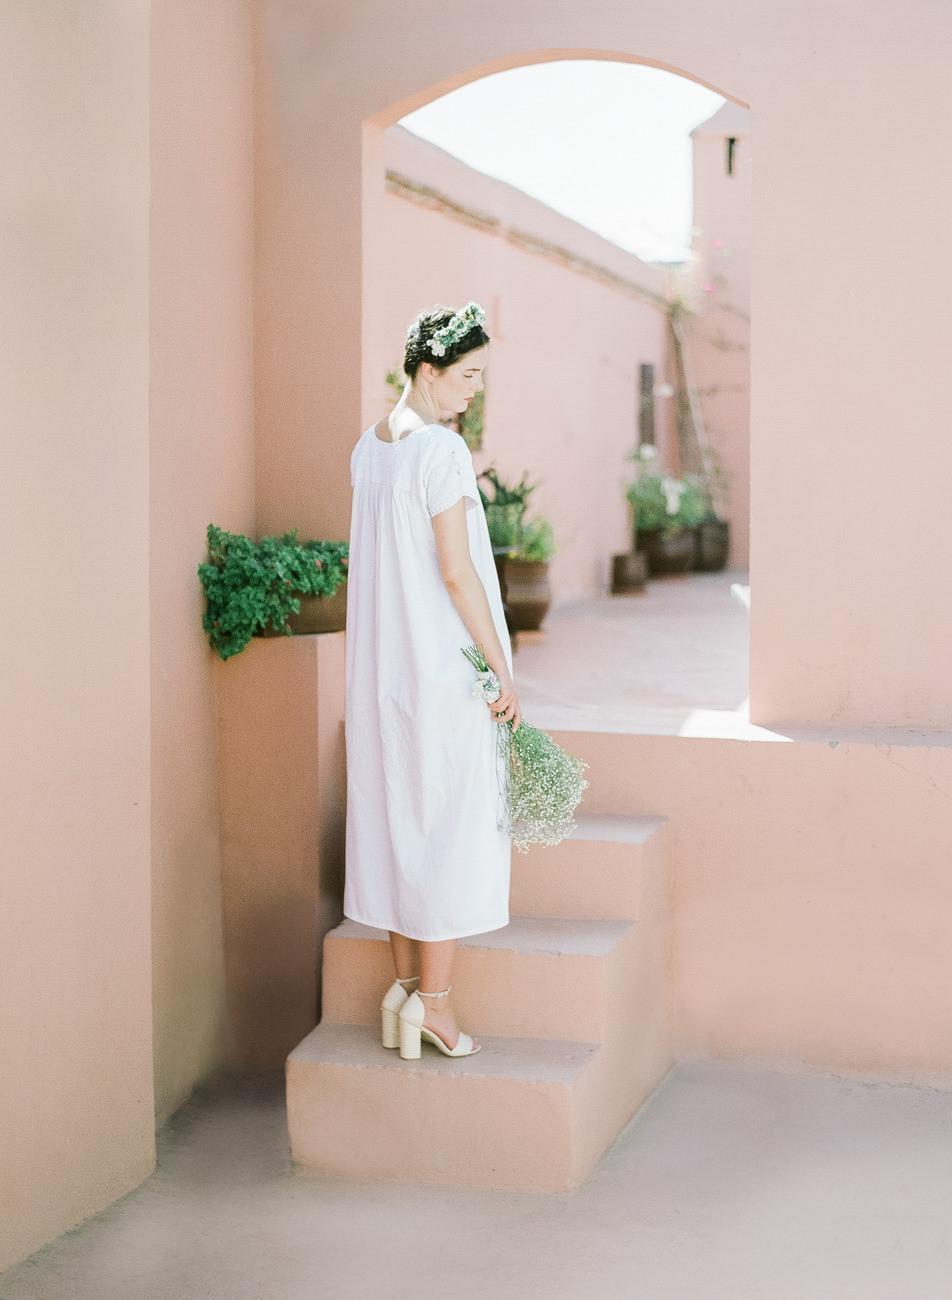 marrakech-photographe-mariage-alain-m-8.jpg